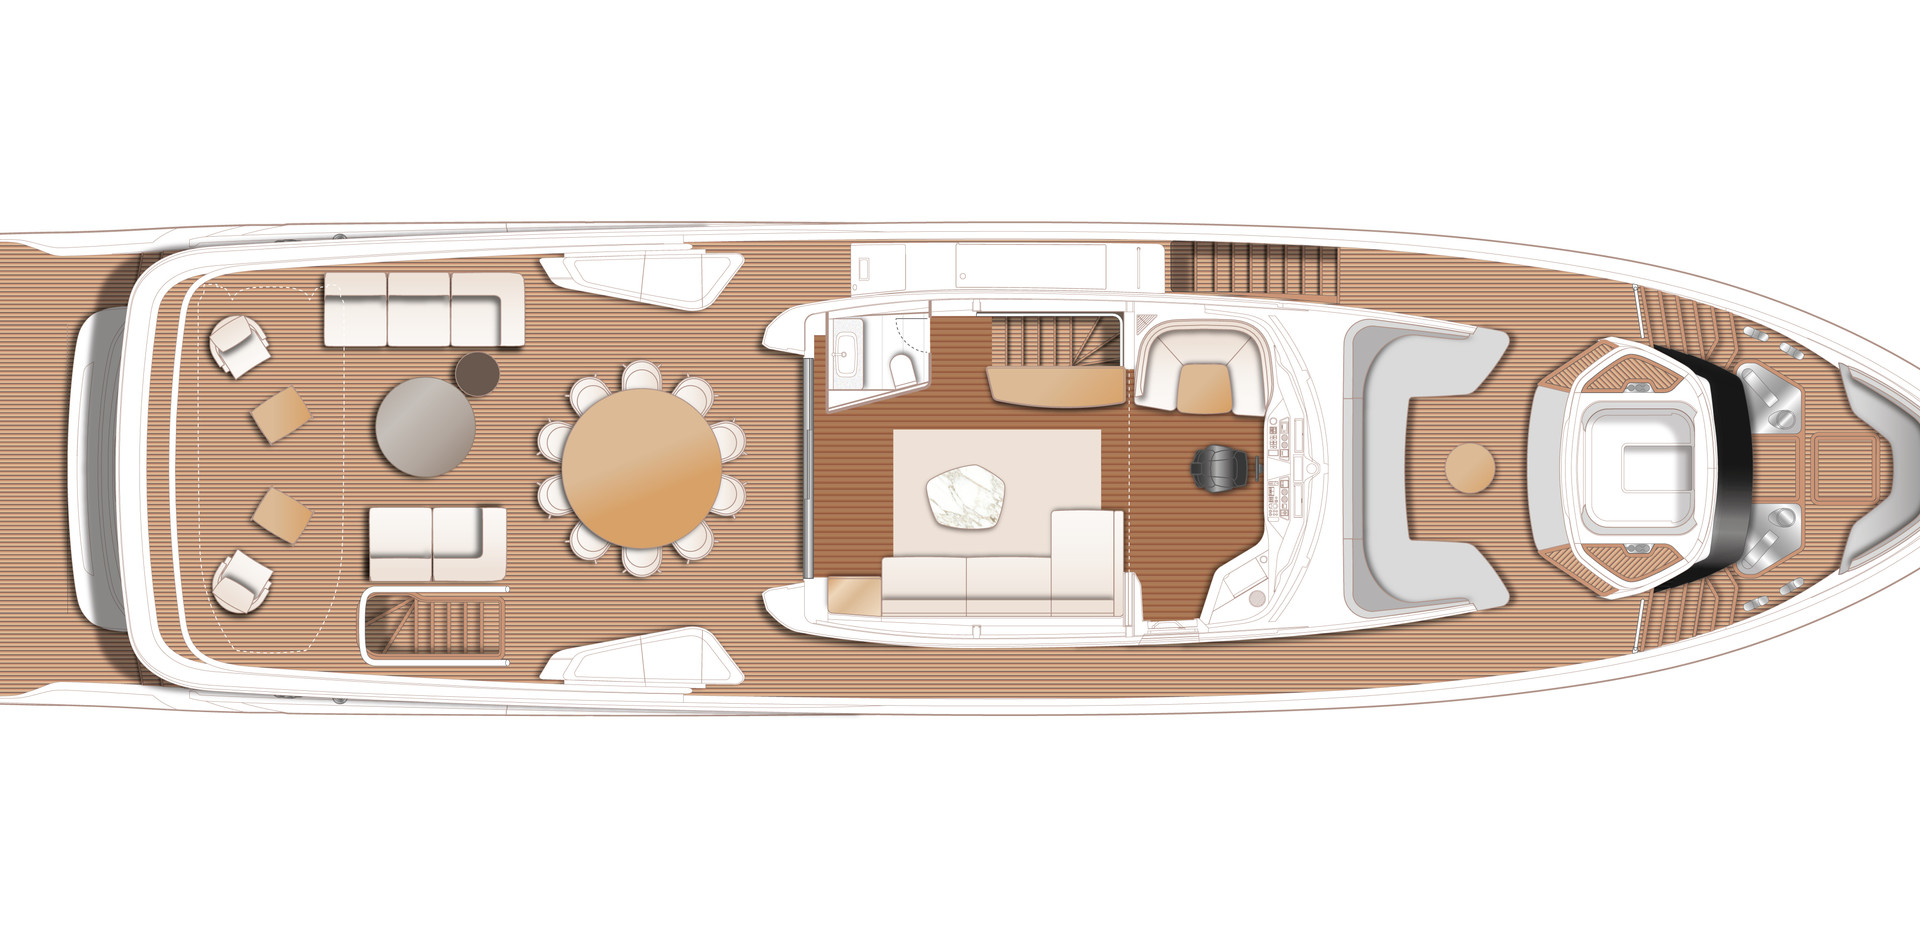 x95-layout-sundeck-optional-spa-bath-day